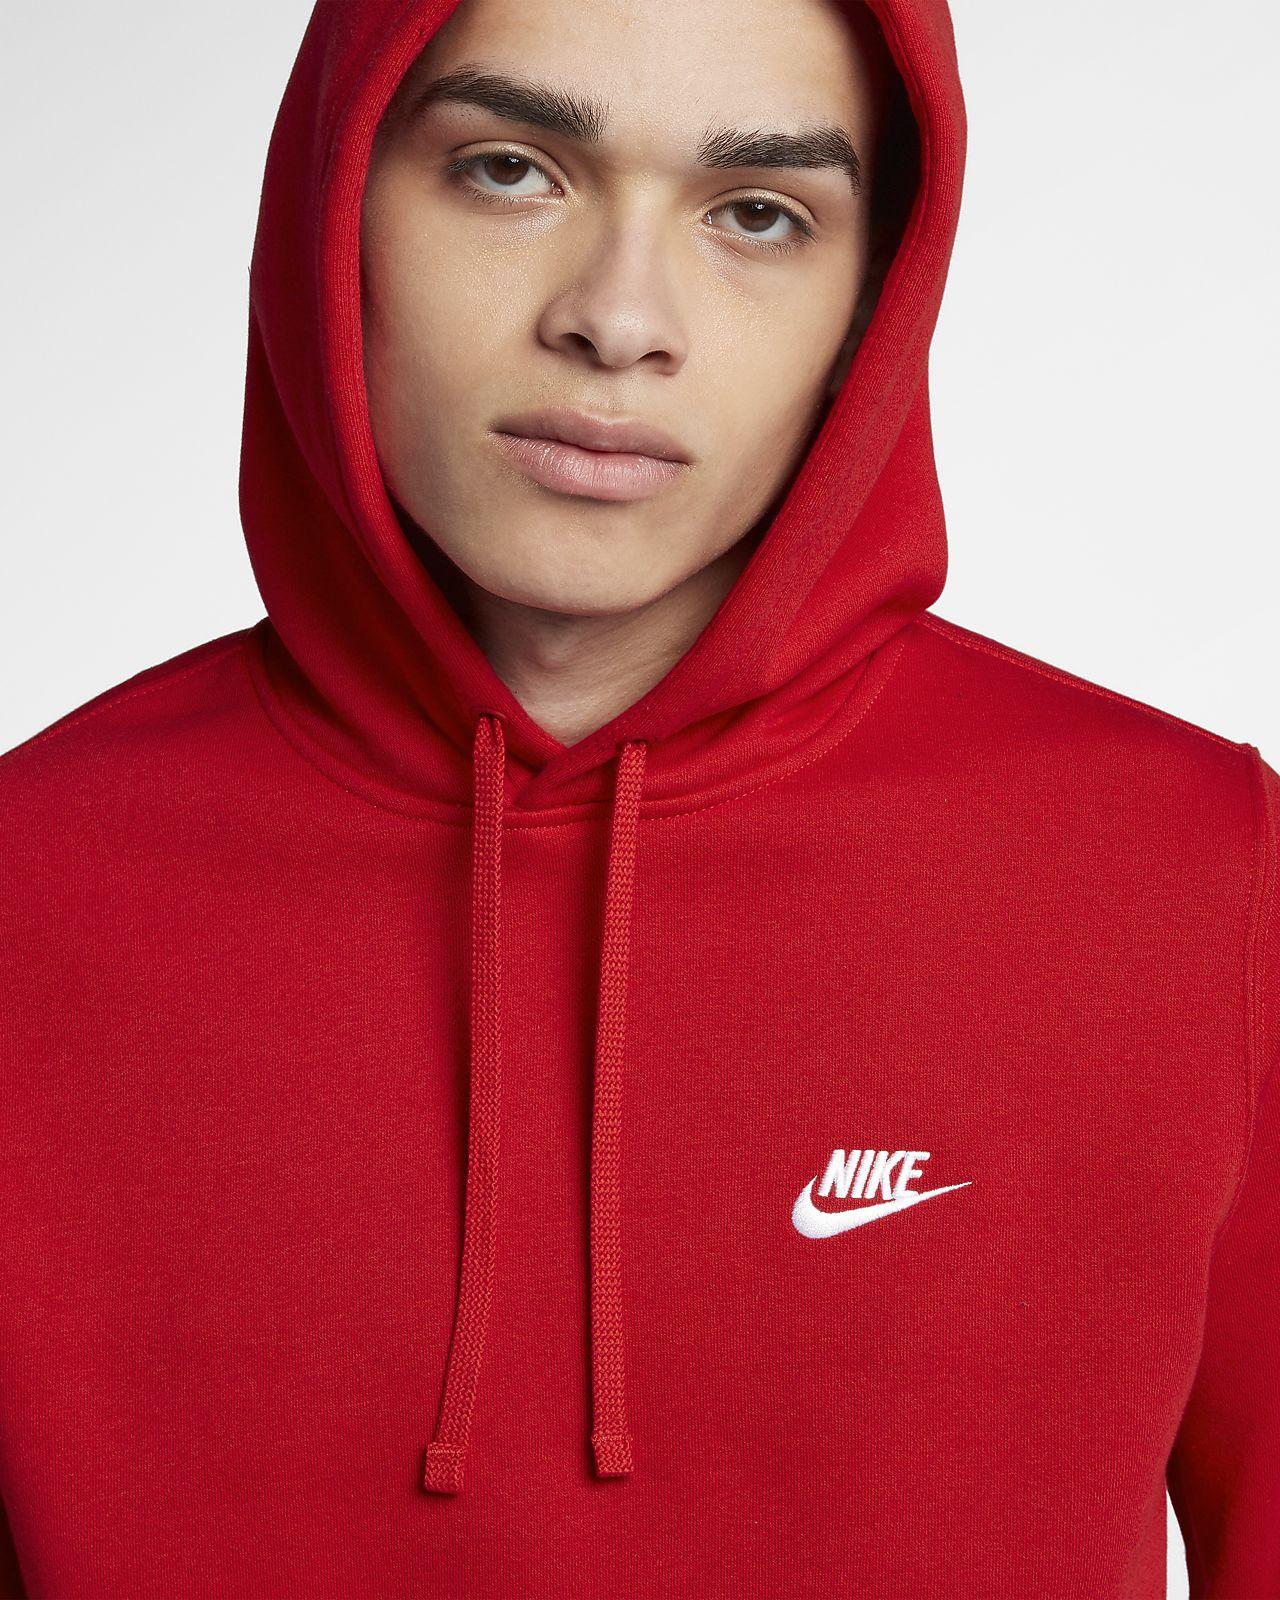 a20ca8539448 Nike Sportswear Club Fleece Pullover Hoodie. Nike.com